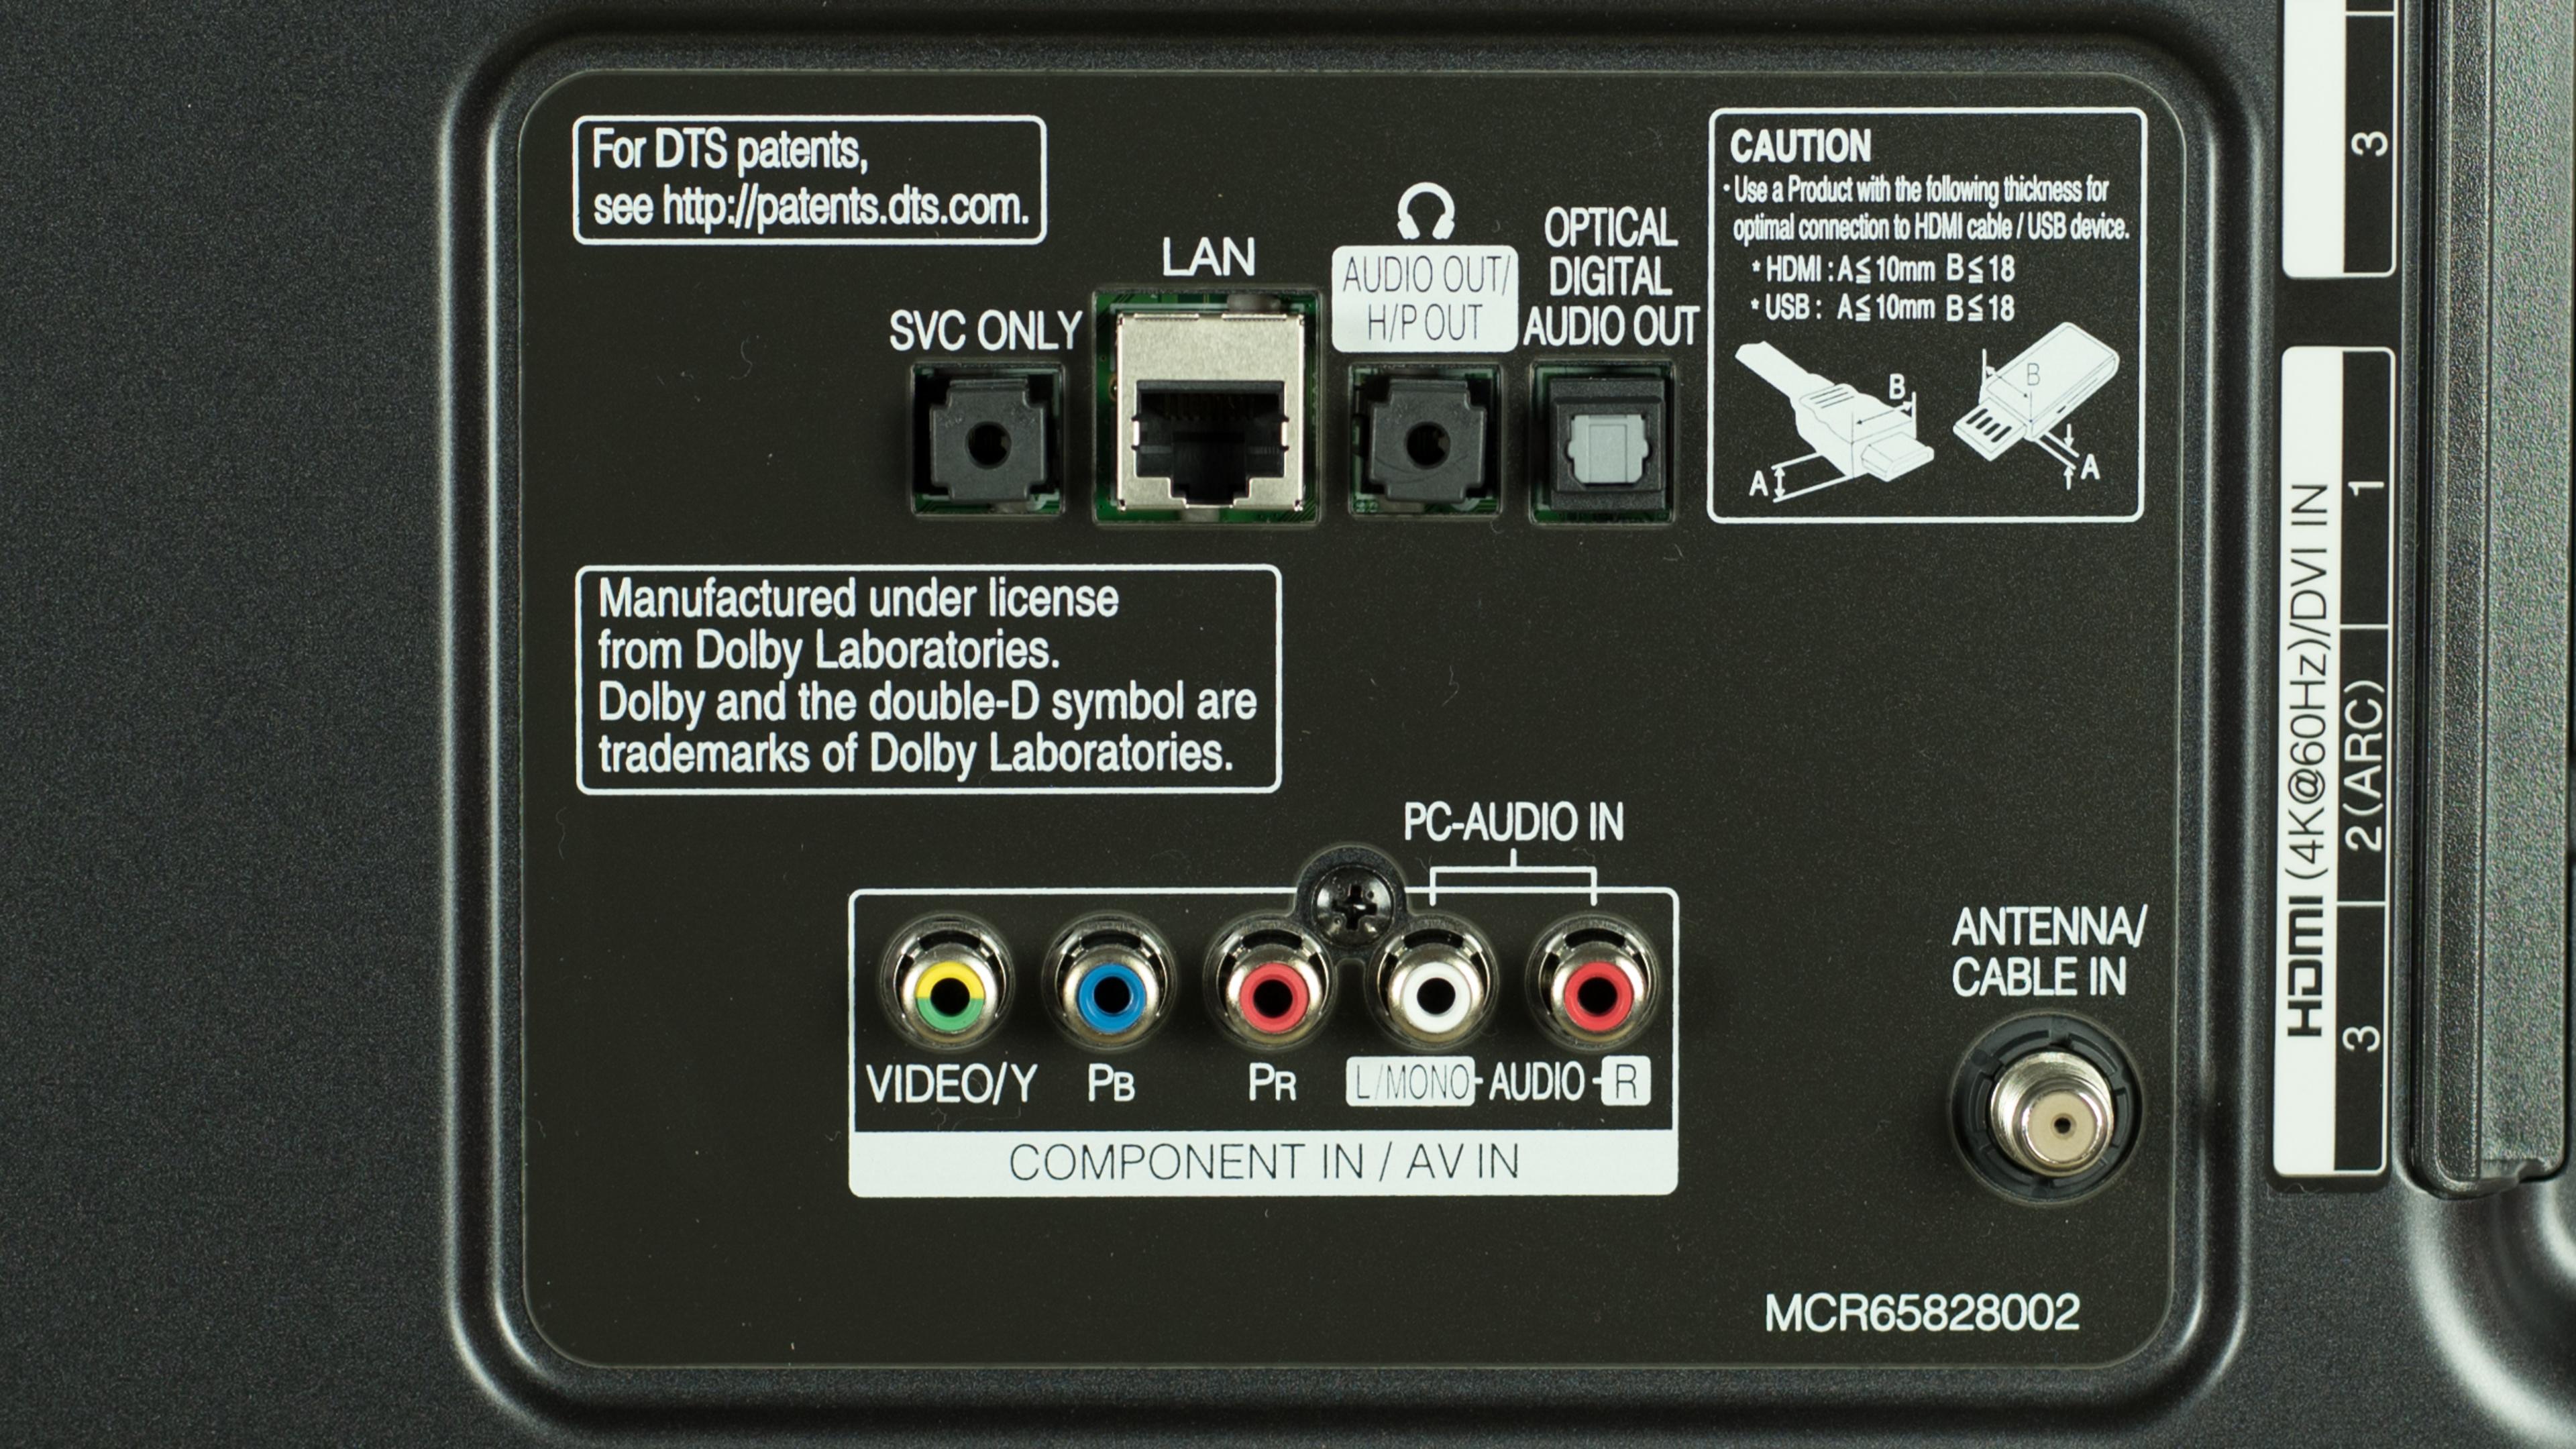 Lg Uf8500 Review 60uf8500 65uf8500 Rtings Com